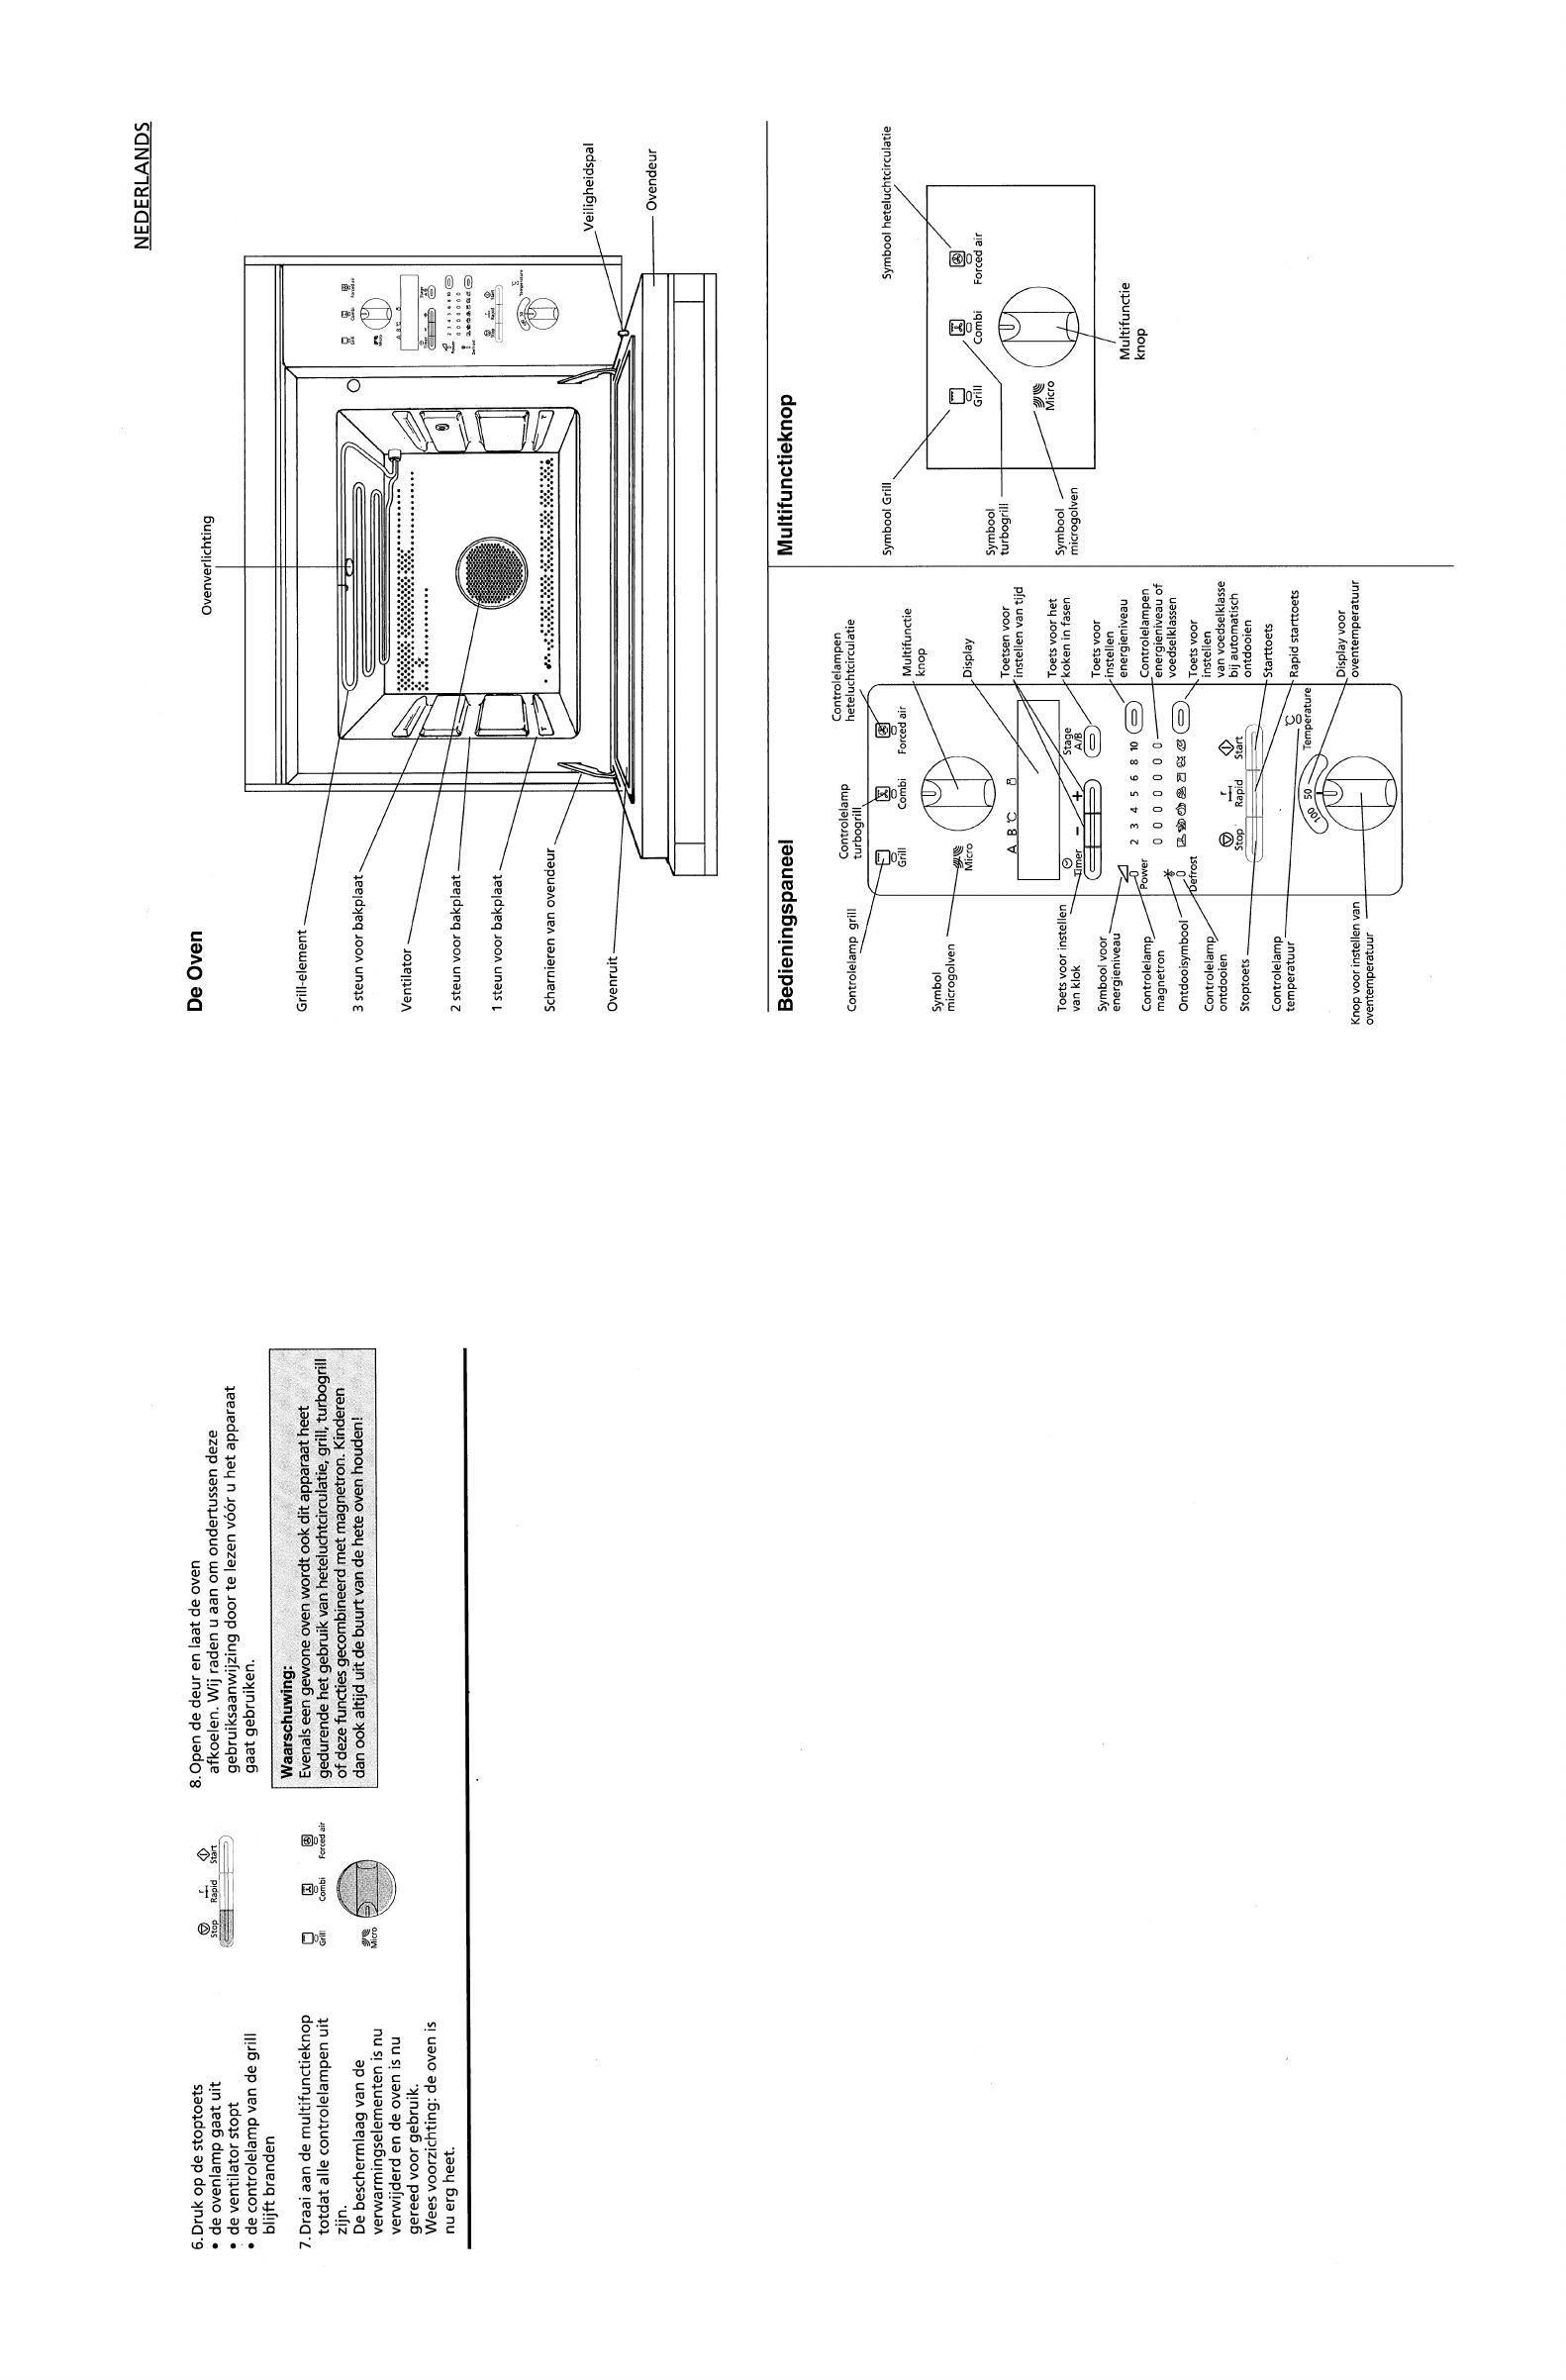 handleiding bauknecht dmcg 5735 pagina 27 van 28 fran ais nederlands. Black Bedroom Furniture Sets. Home Design Ideas